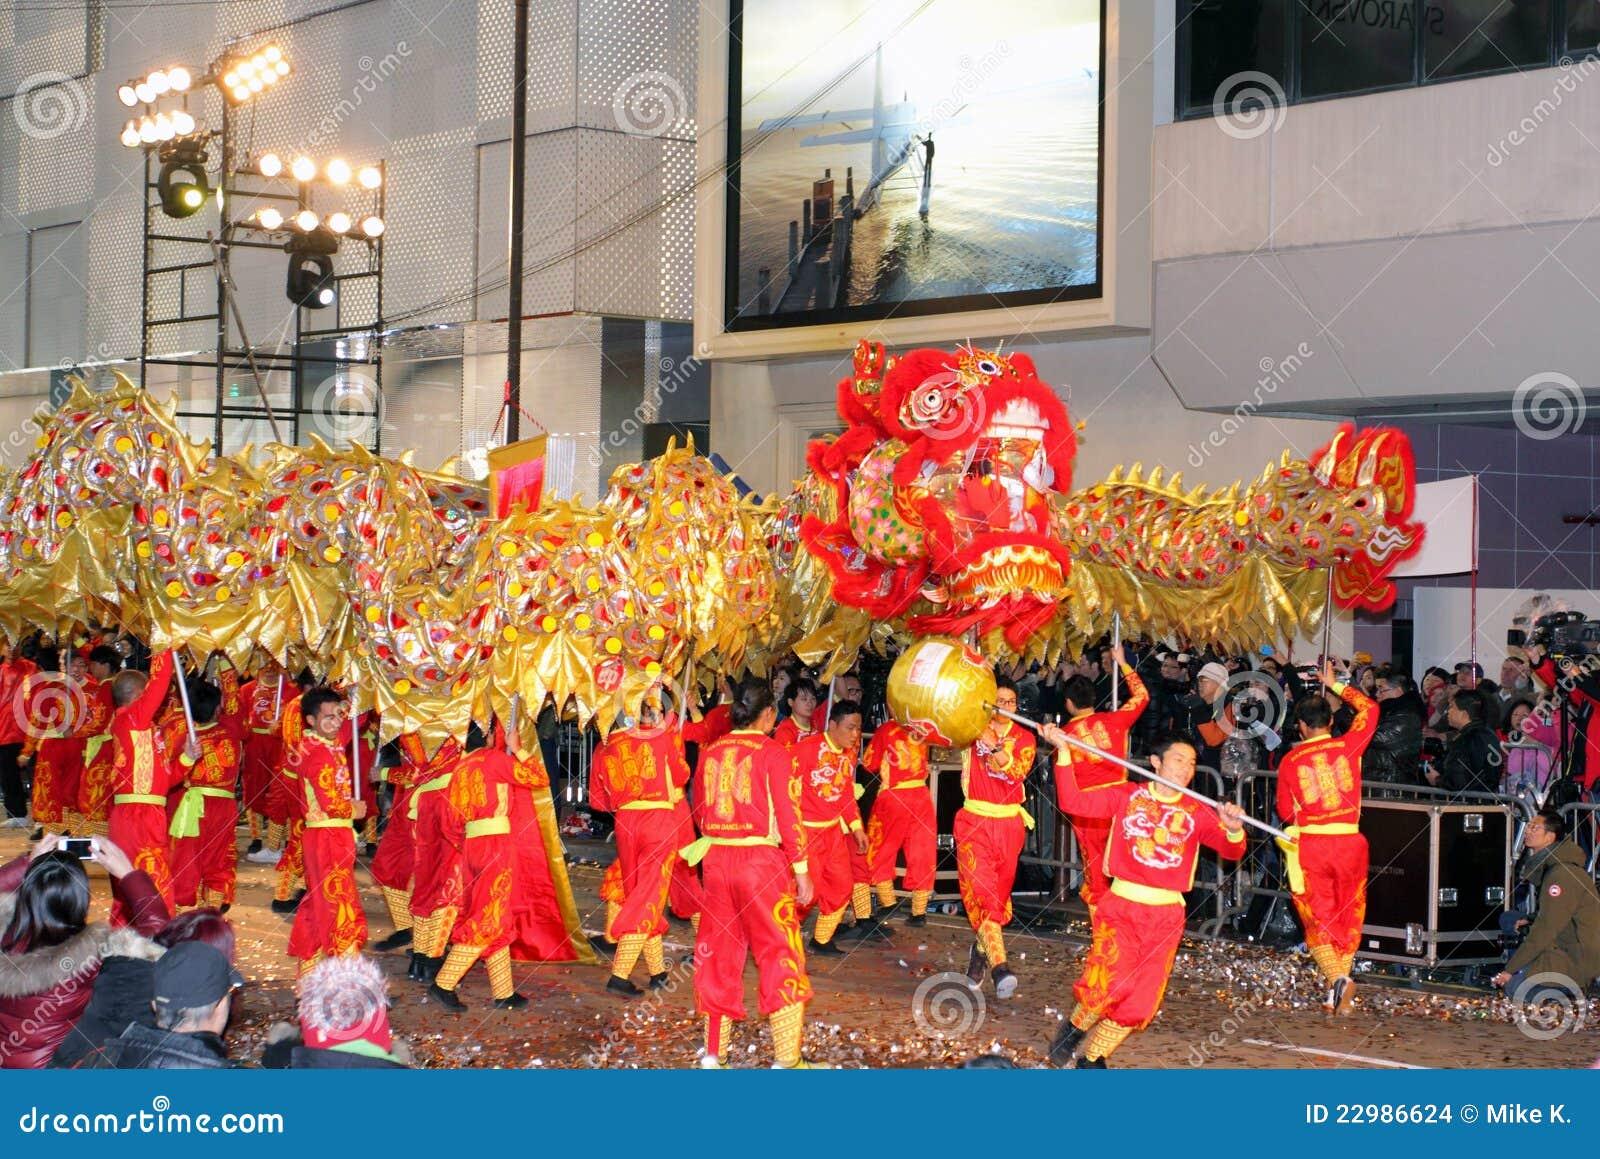 Défilé chinois international 2012 de nuit d an neuf